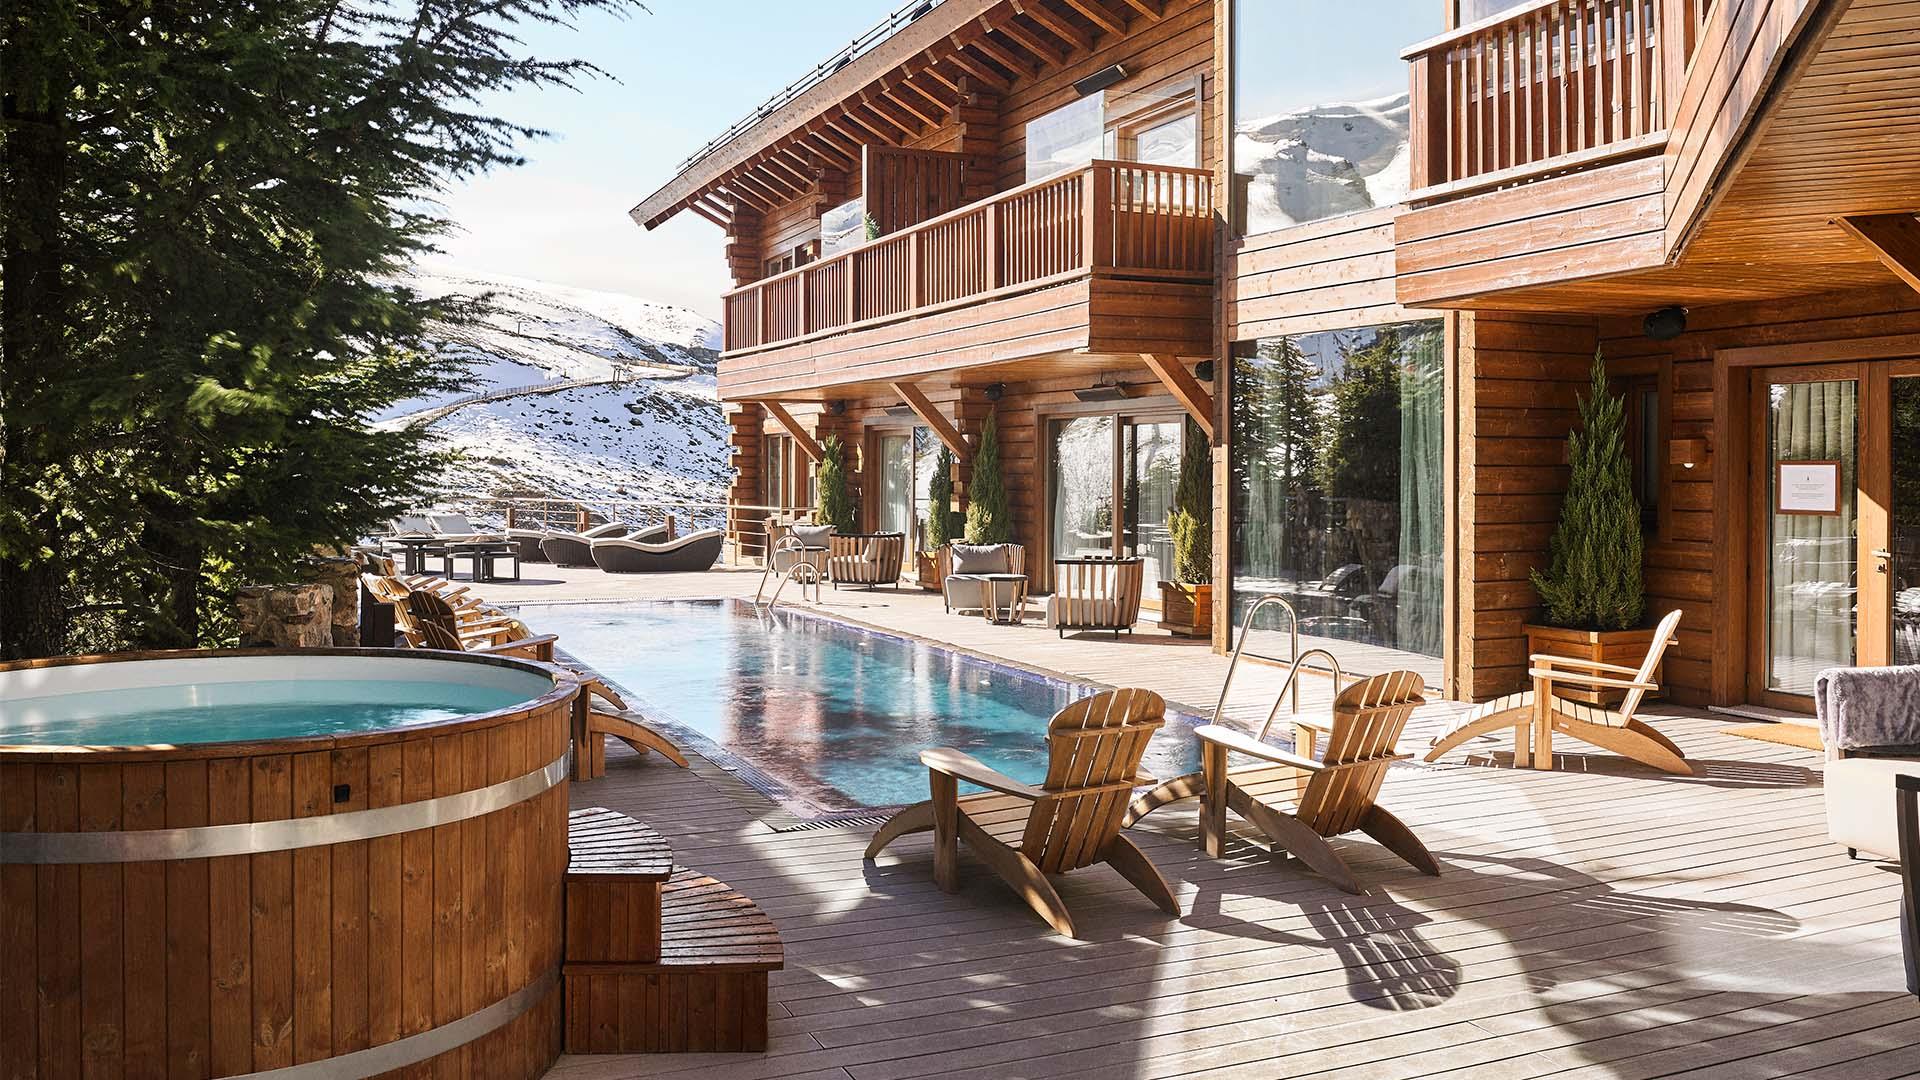 6 sensational ski hotels with hot tubs